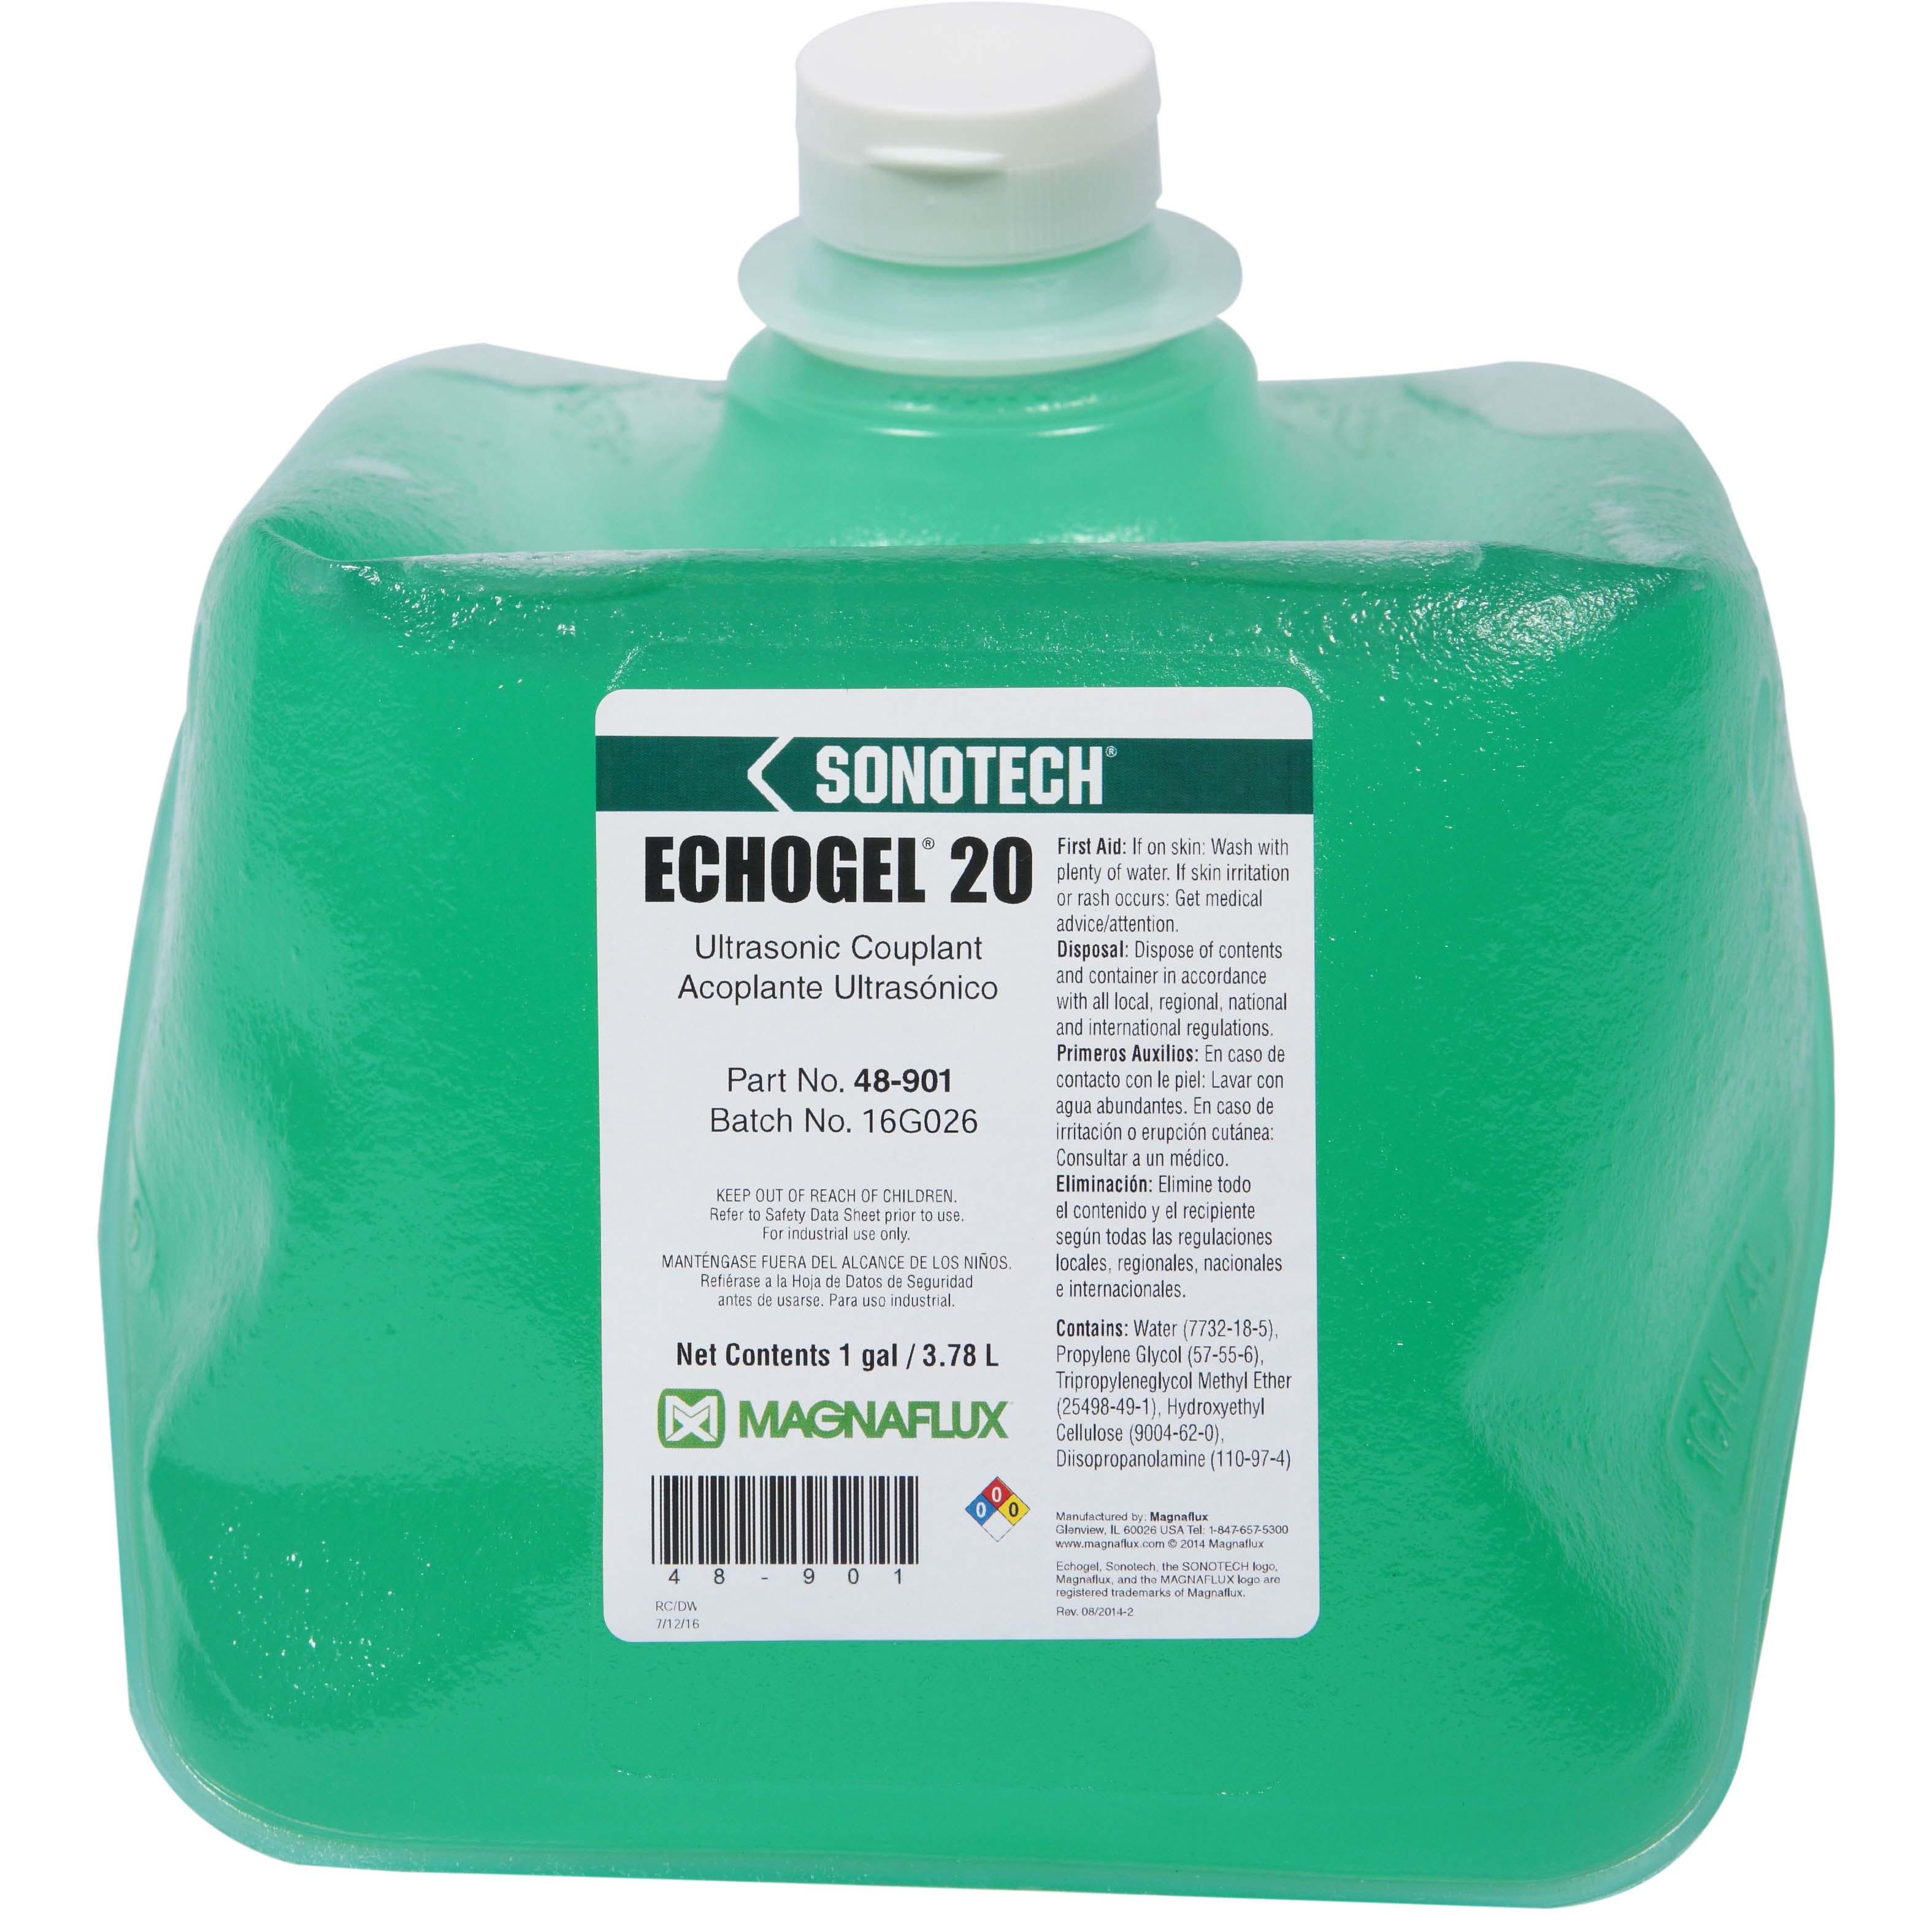 Magnaflux Echogel 20 Ultrasonic Couplant